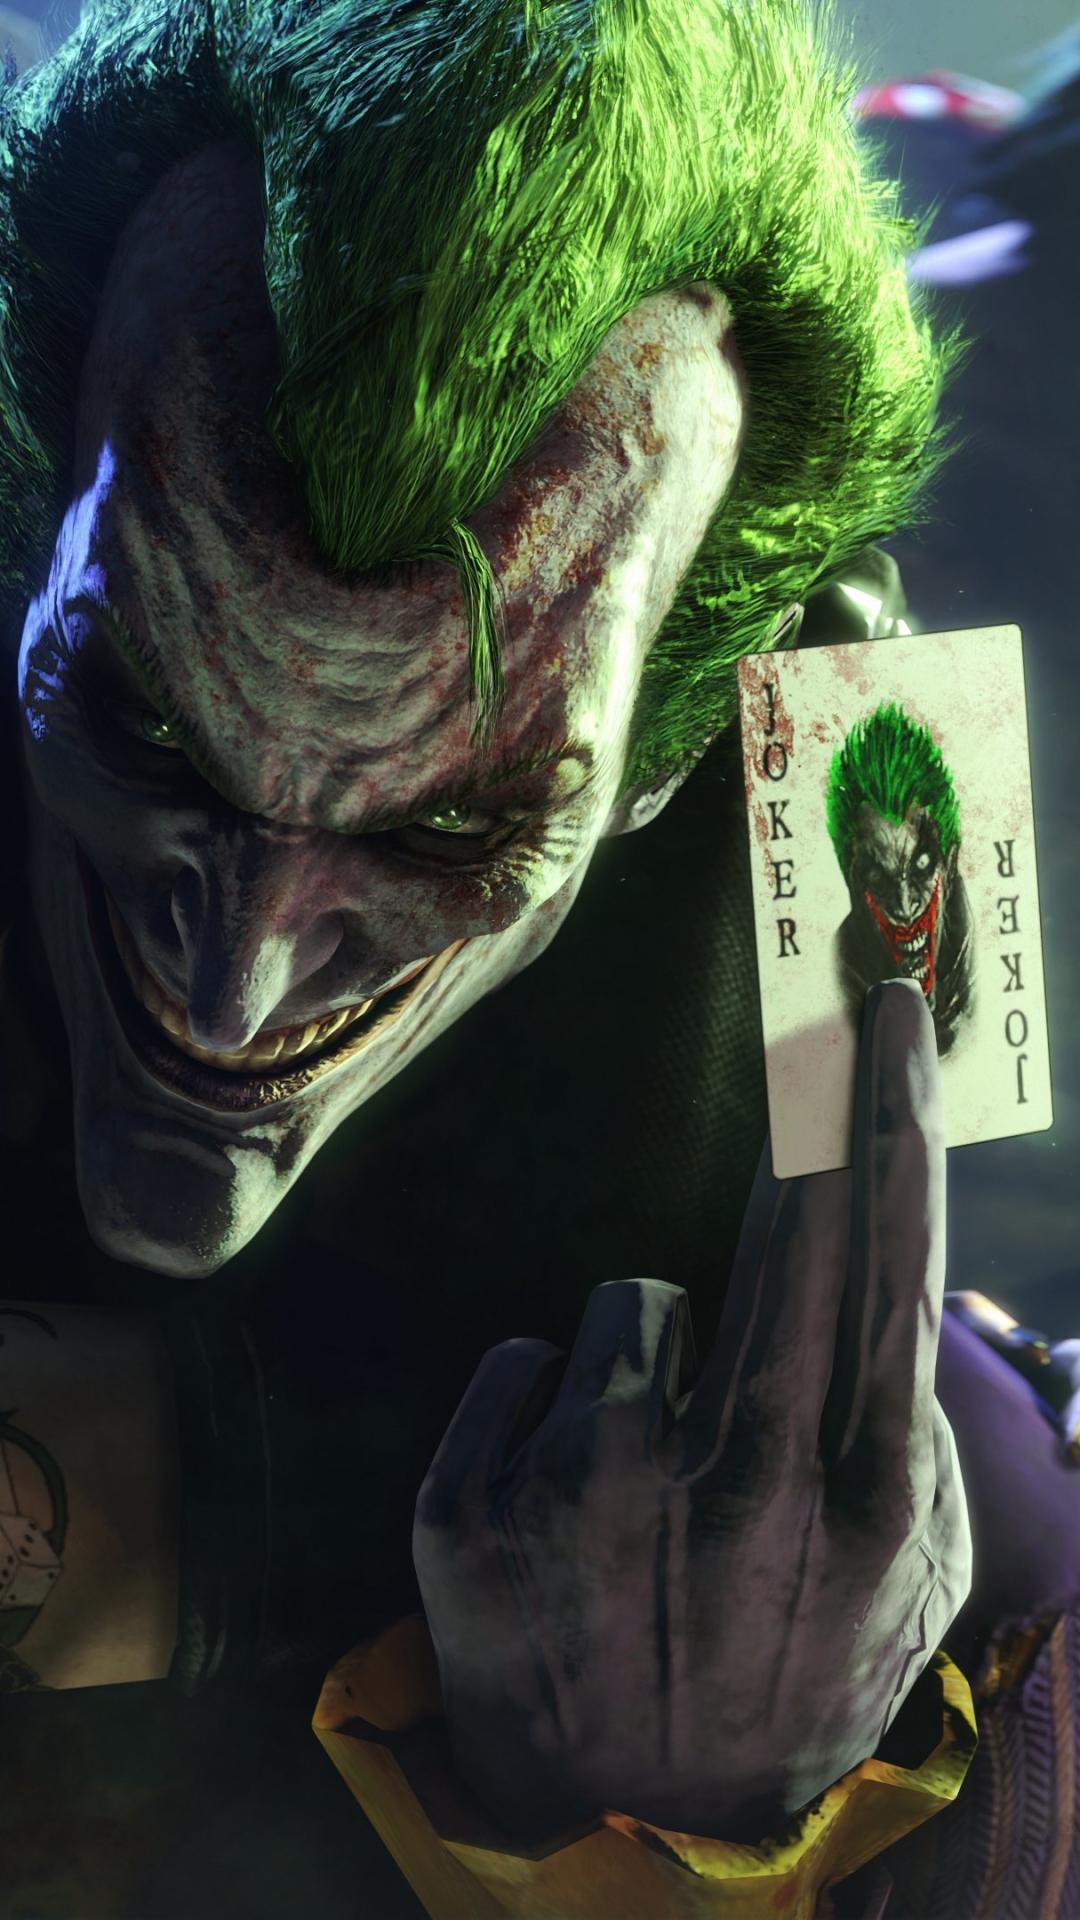 Comics Joker 1080x1920 Mobile Wallpaper